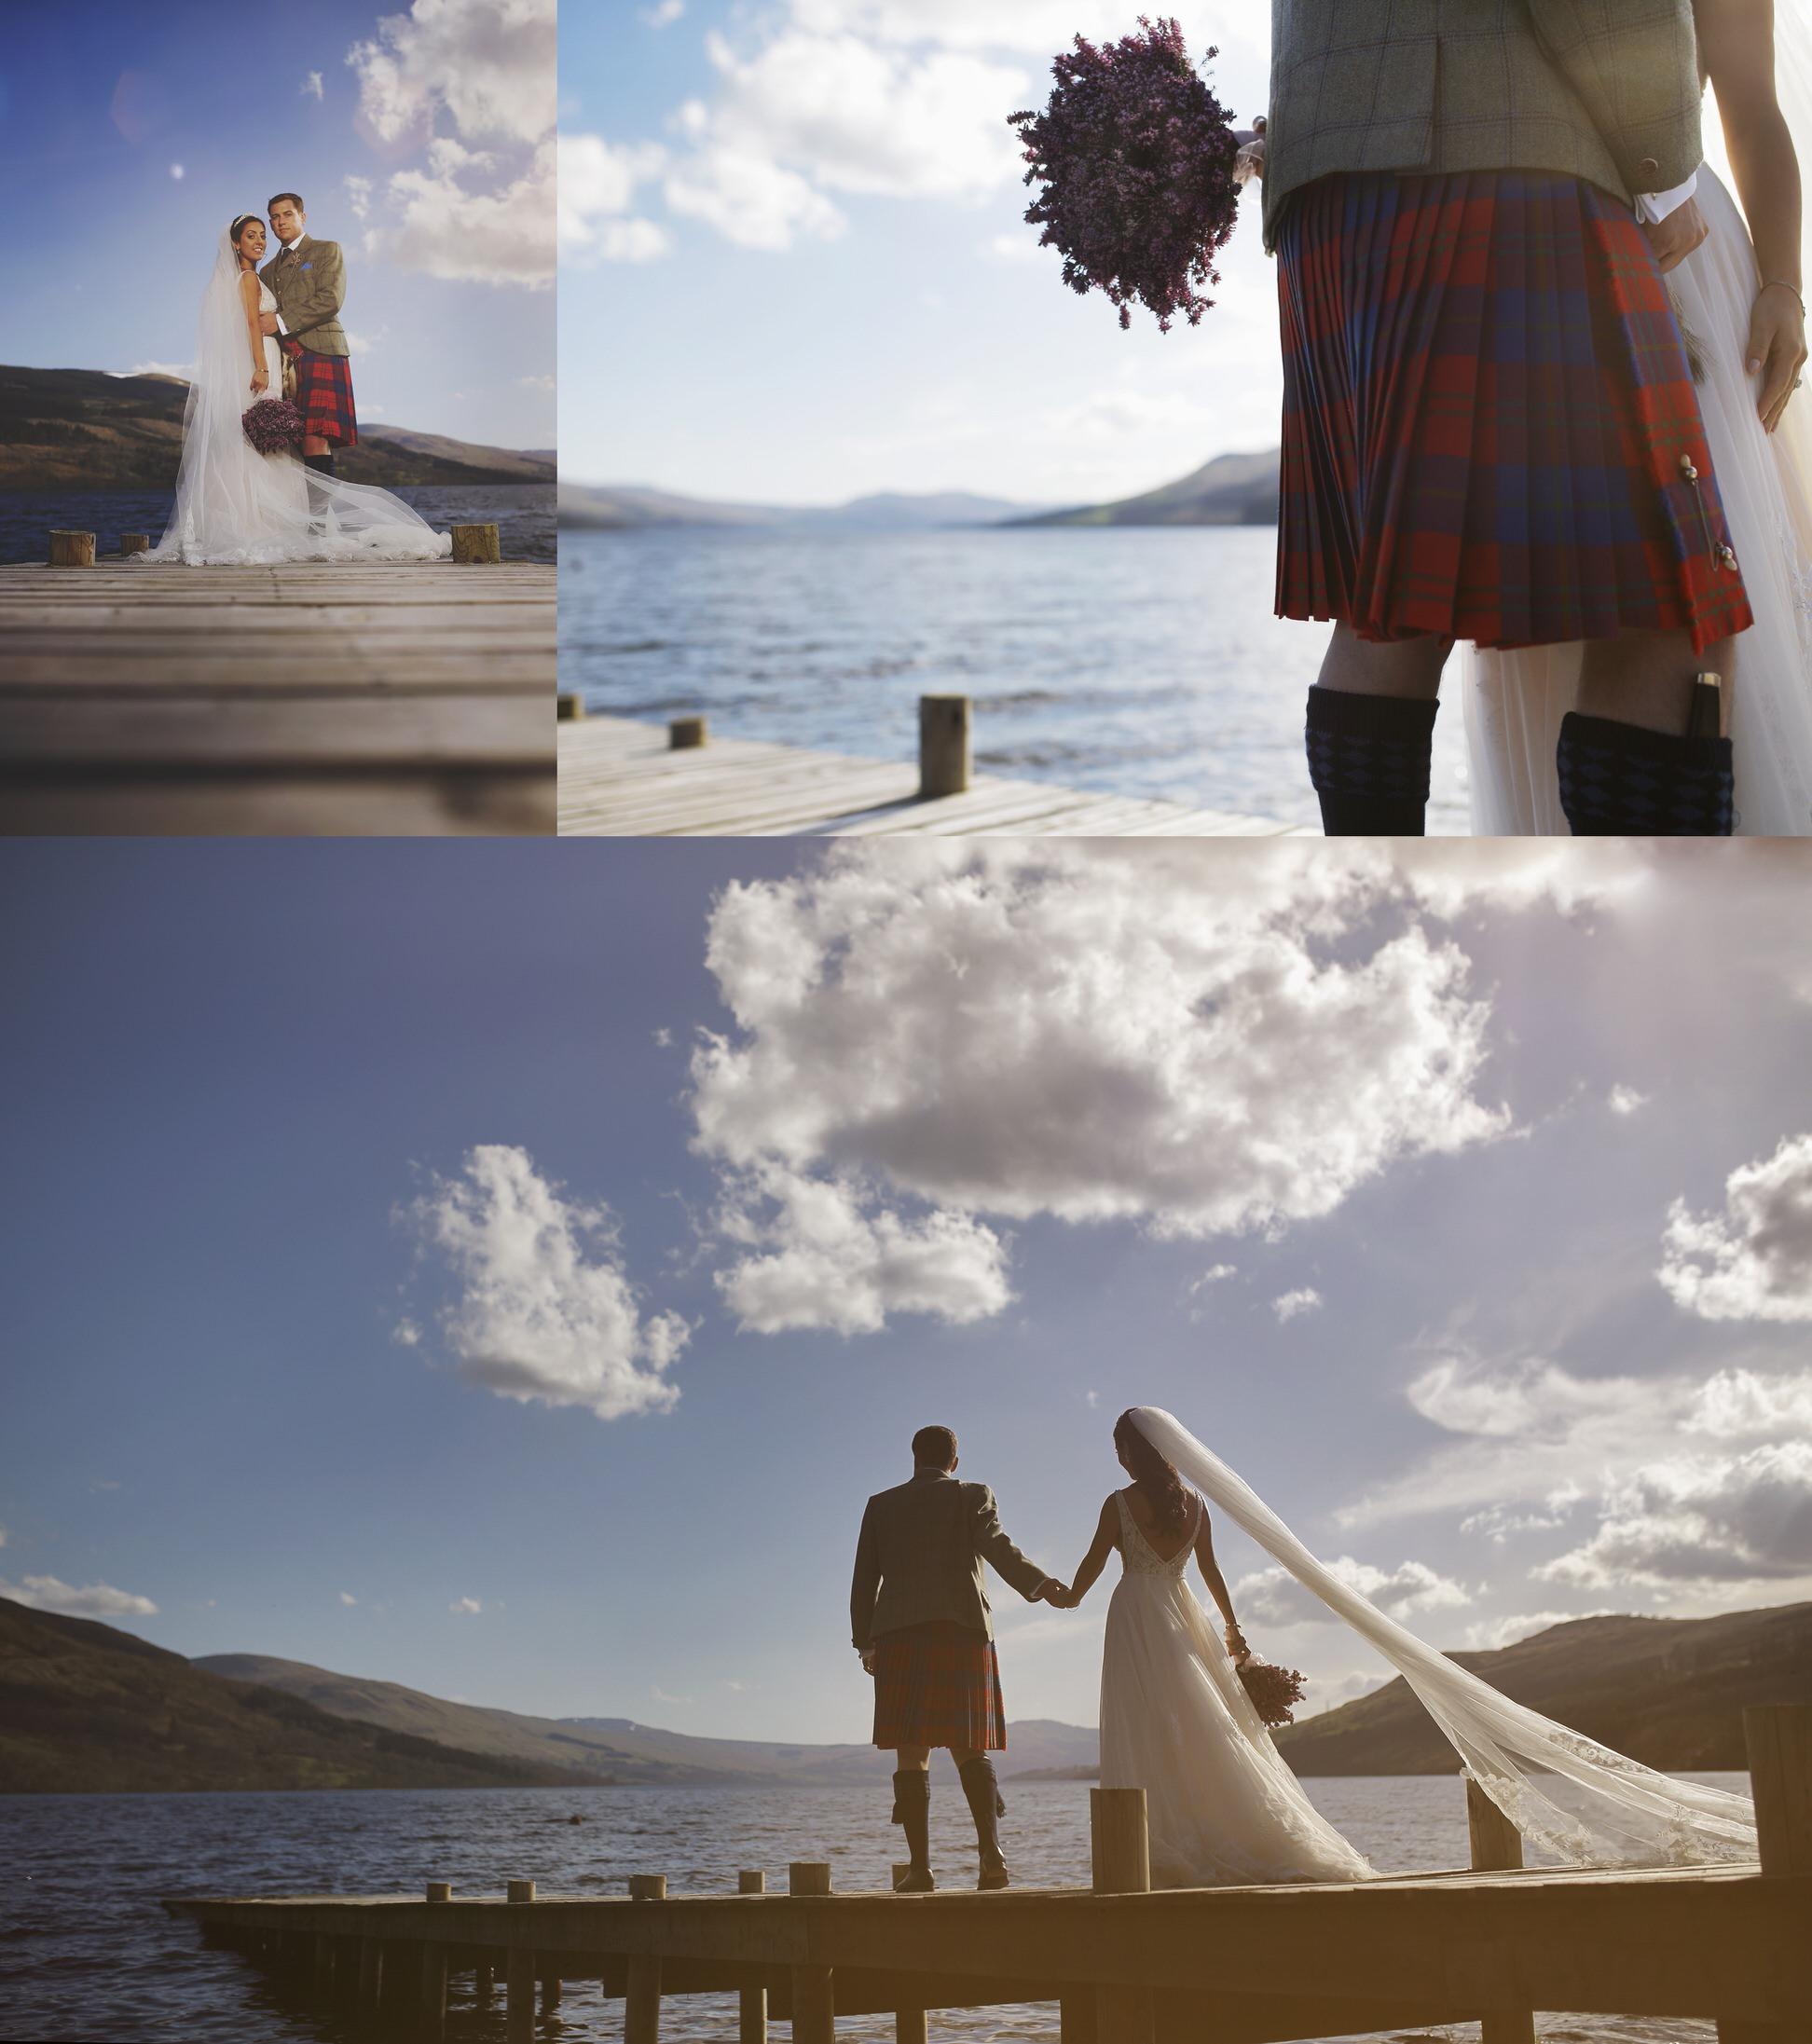 brett-harkness-cotland-wedding-photographer-highland-wedding_0024.jpg